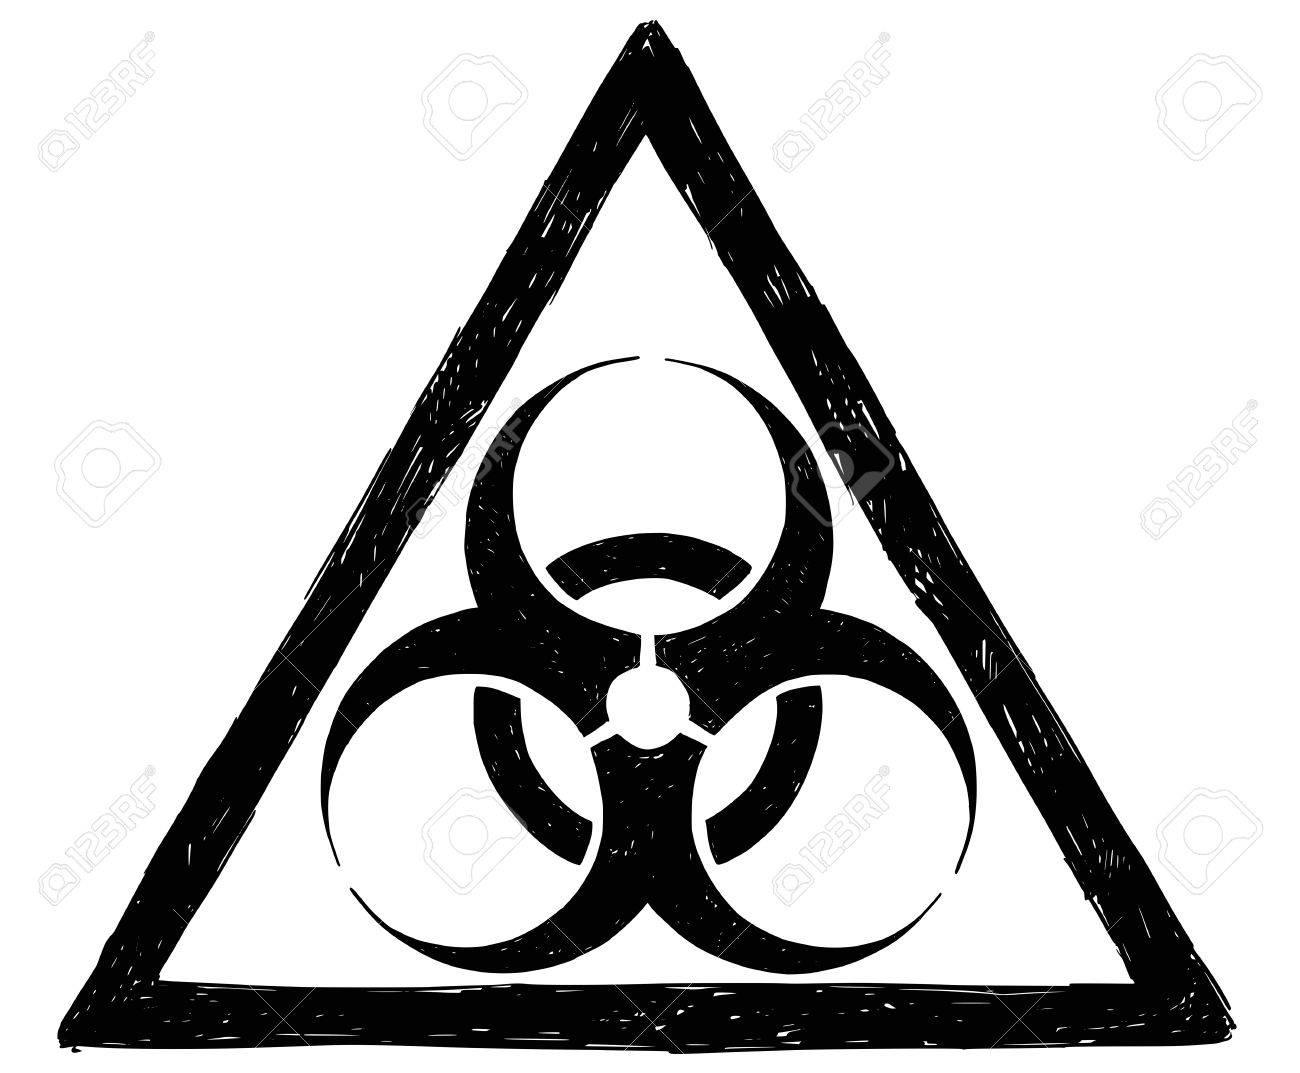 Vector Drawing Illustration Of Biohazard Symbol Sign Royalty Free